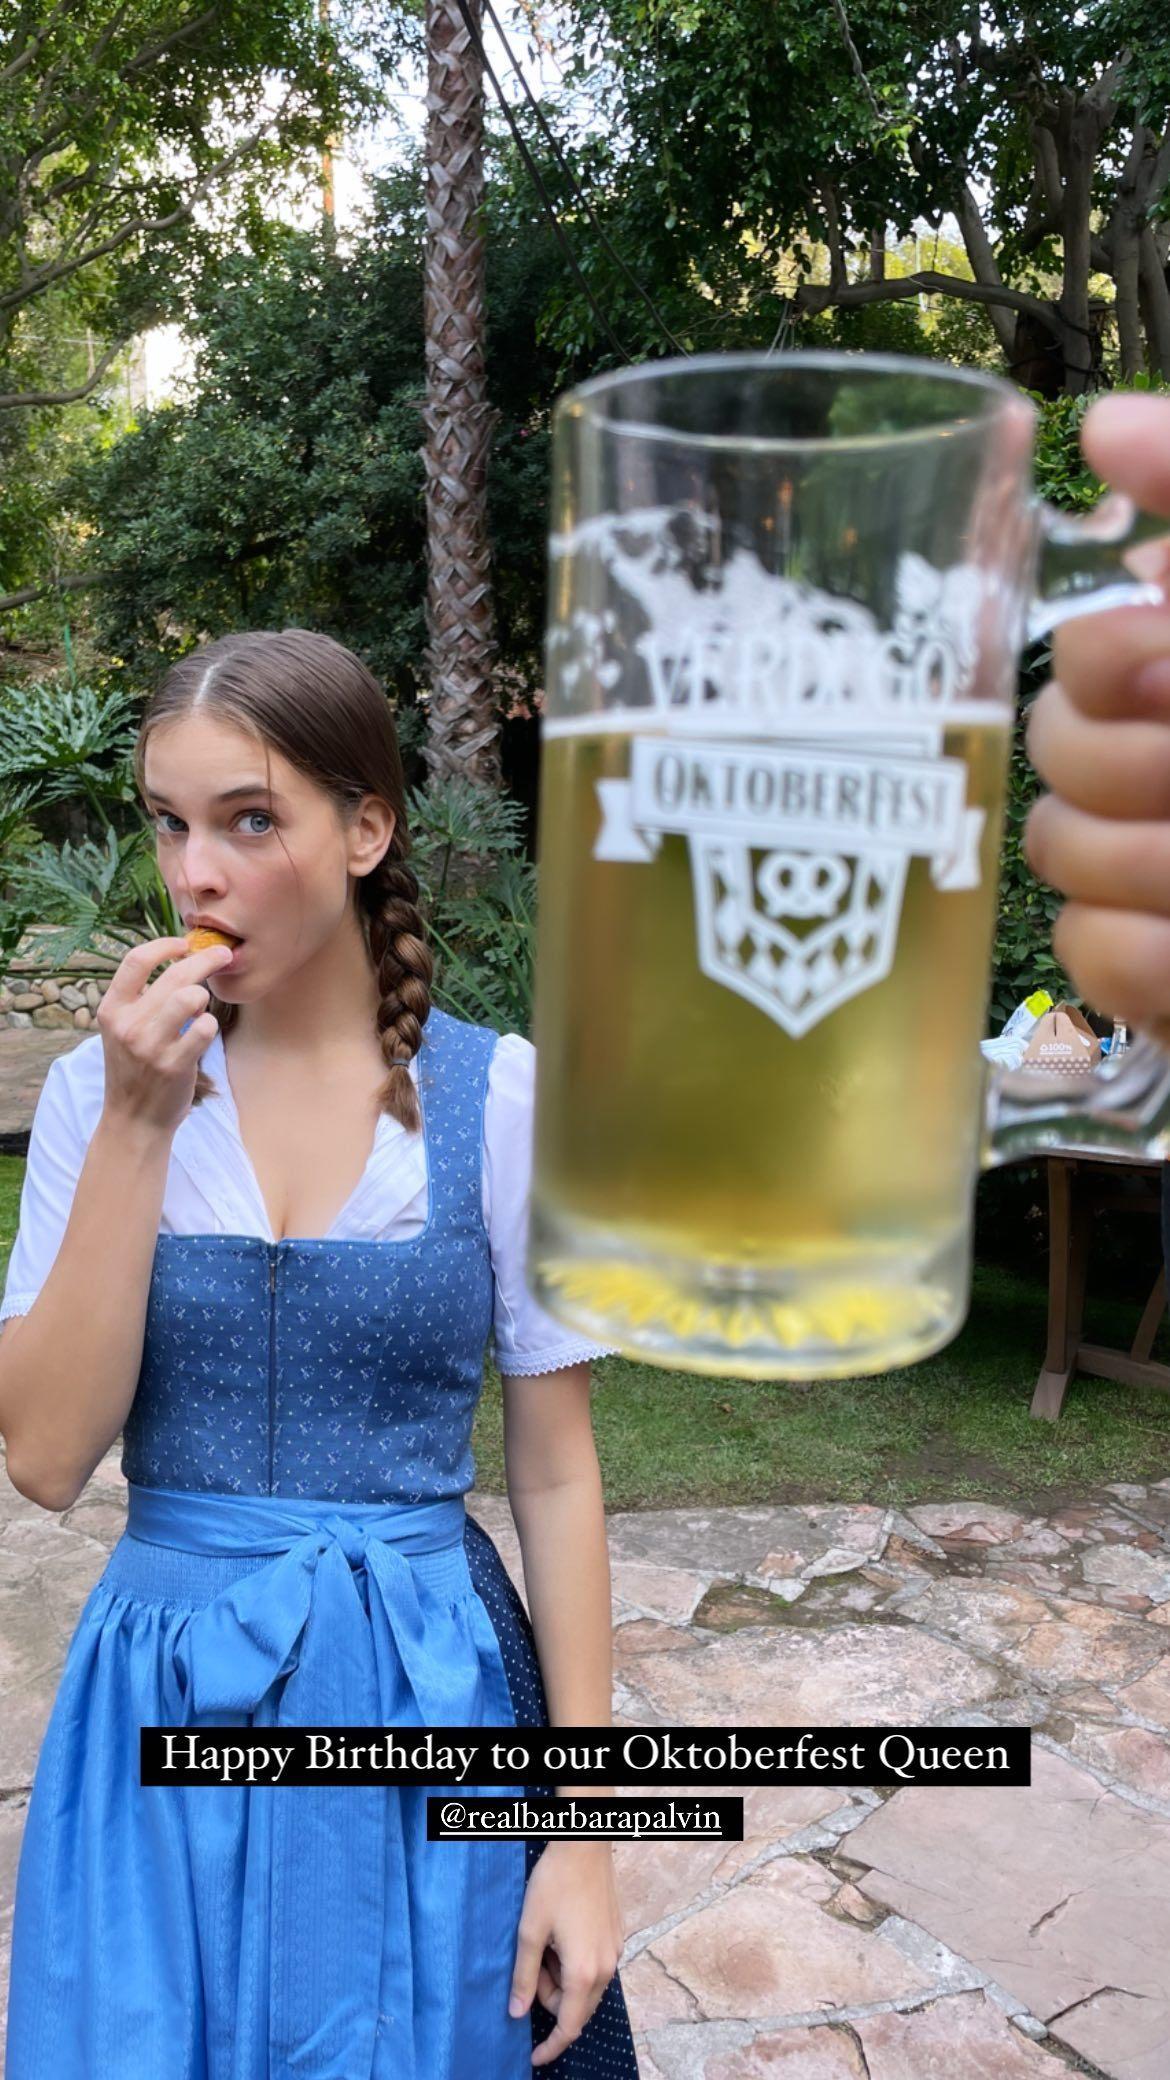 L?anniversaire de Barbara Palvin à l?Oktoberfest! - Photo 9